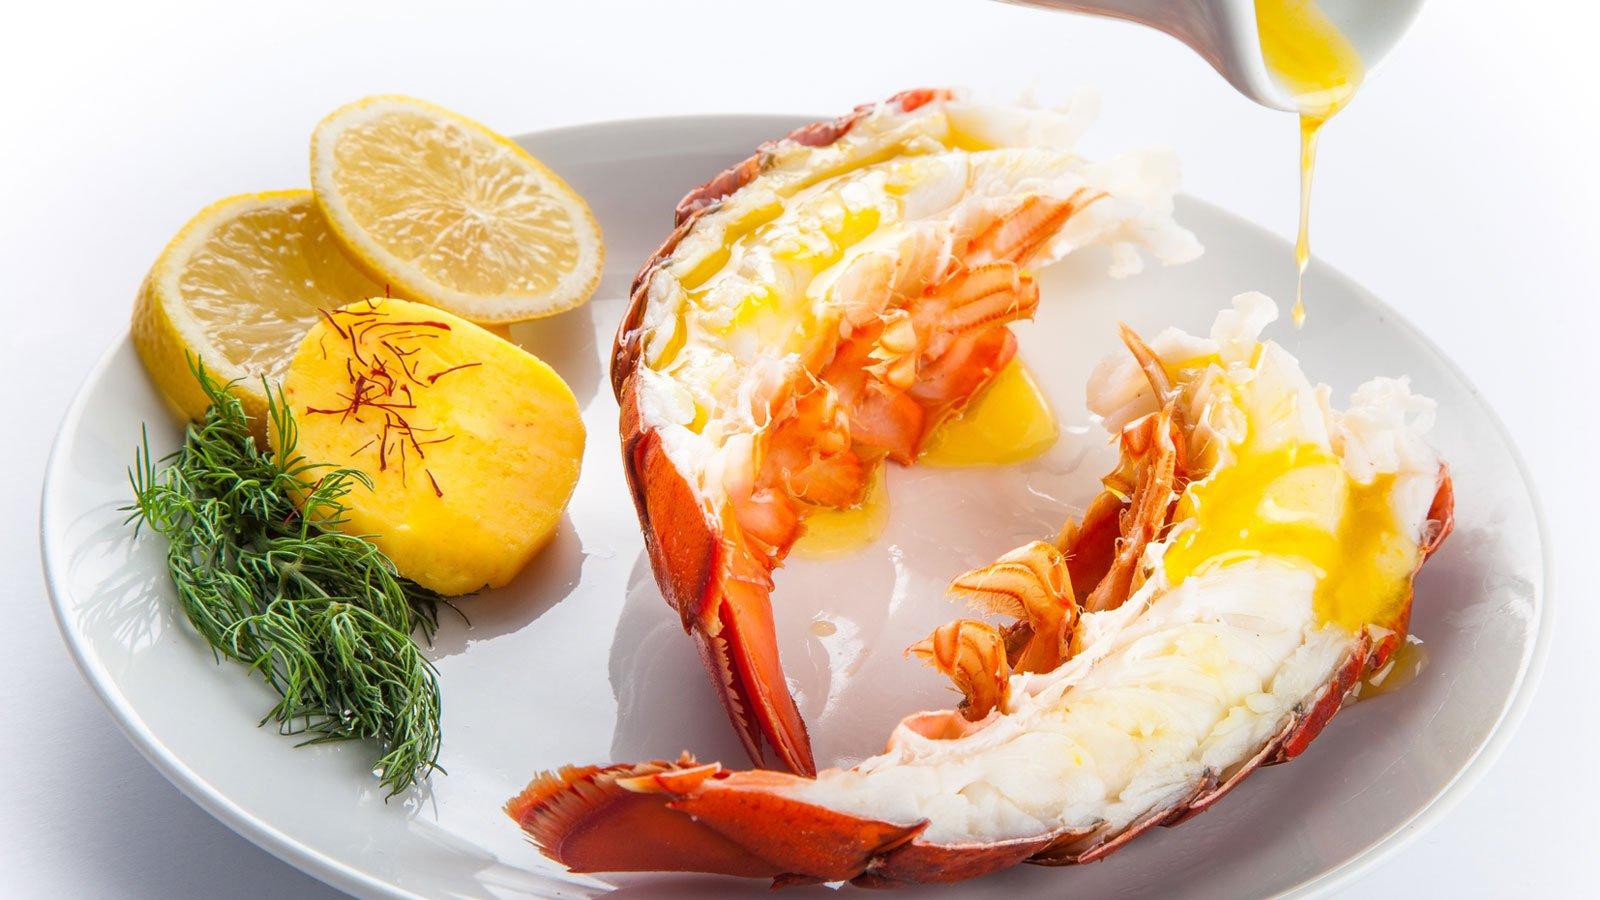 https://0201.nccdn.net/1_2/000/000/153/73d/1600-lobster-tails2_10f5bf5a-8c35-439c-beac-481ad12faf98-1600x900.jpg